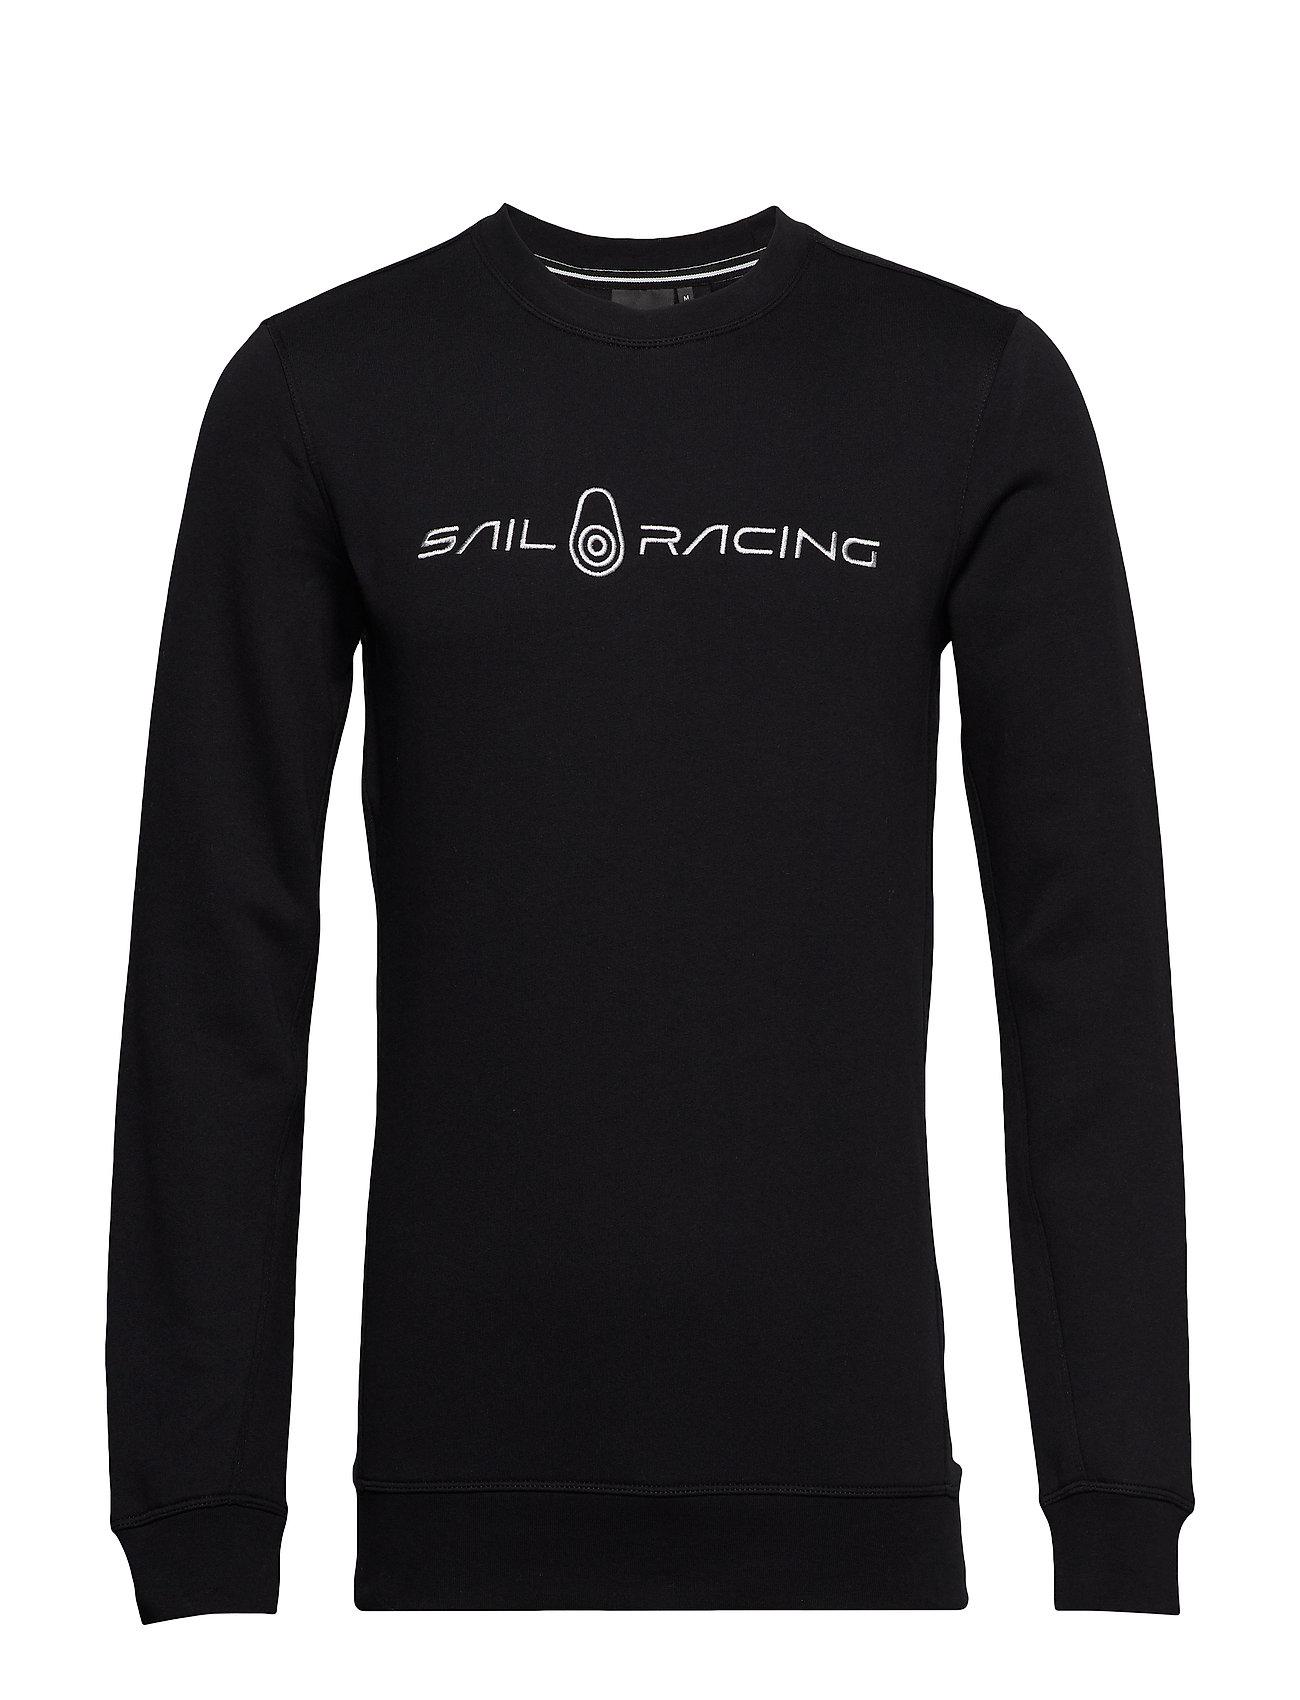 Bowman Sweater Sweatshirt Trøje Sort Sail Racing